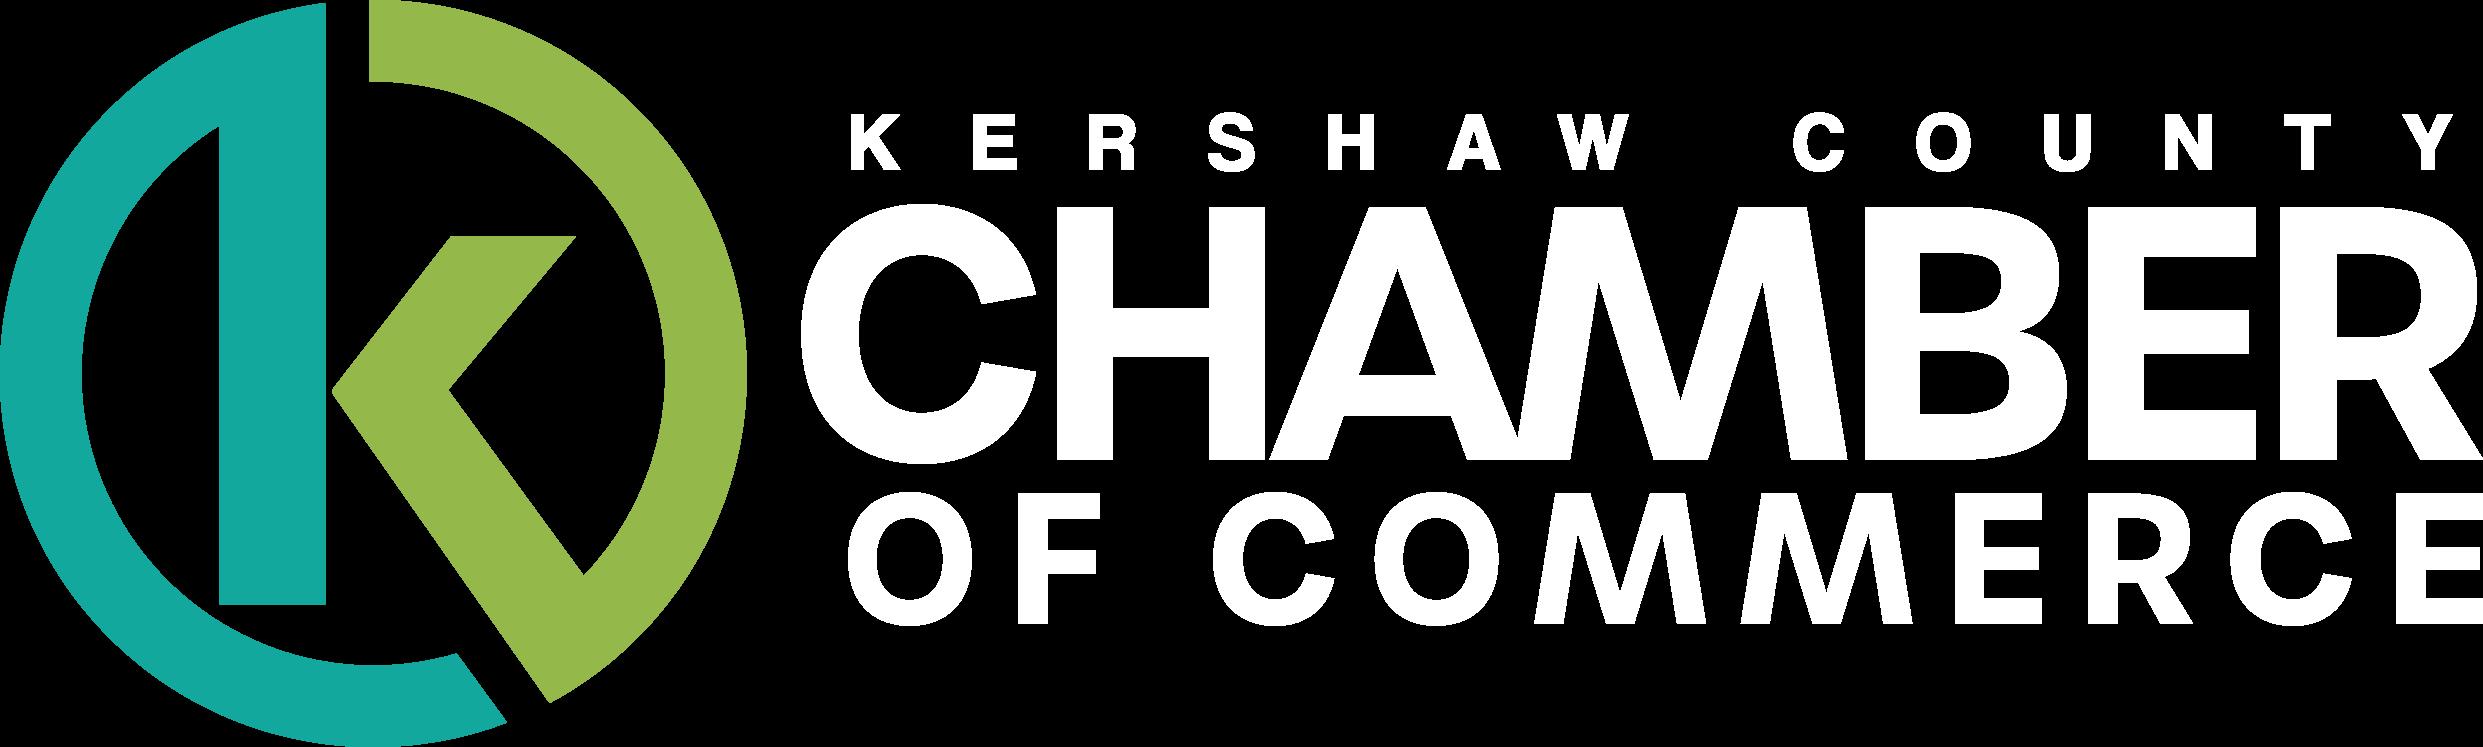 Shop Kershaw County Digital Gift